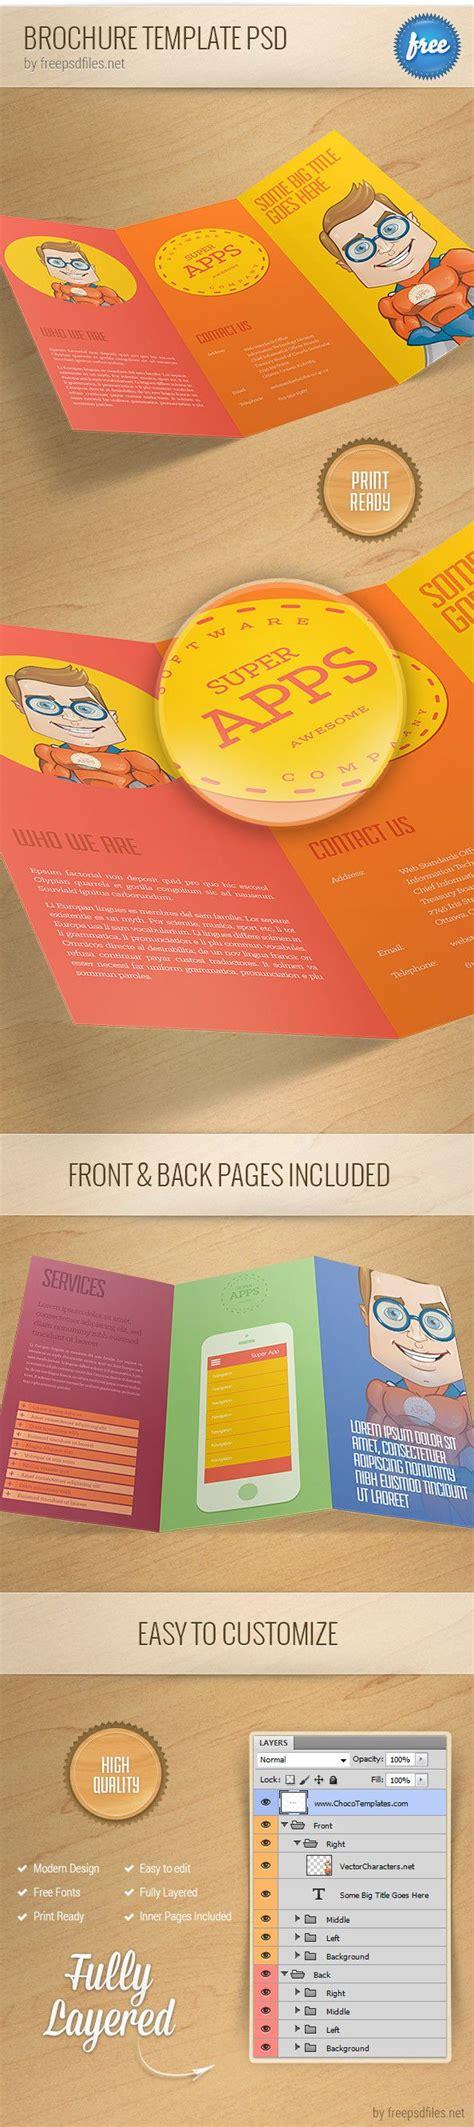 template 1 psd by an1ken 17 best ideas about free brochure on bank